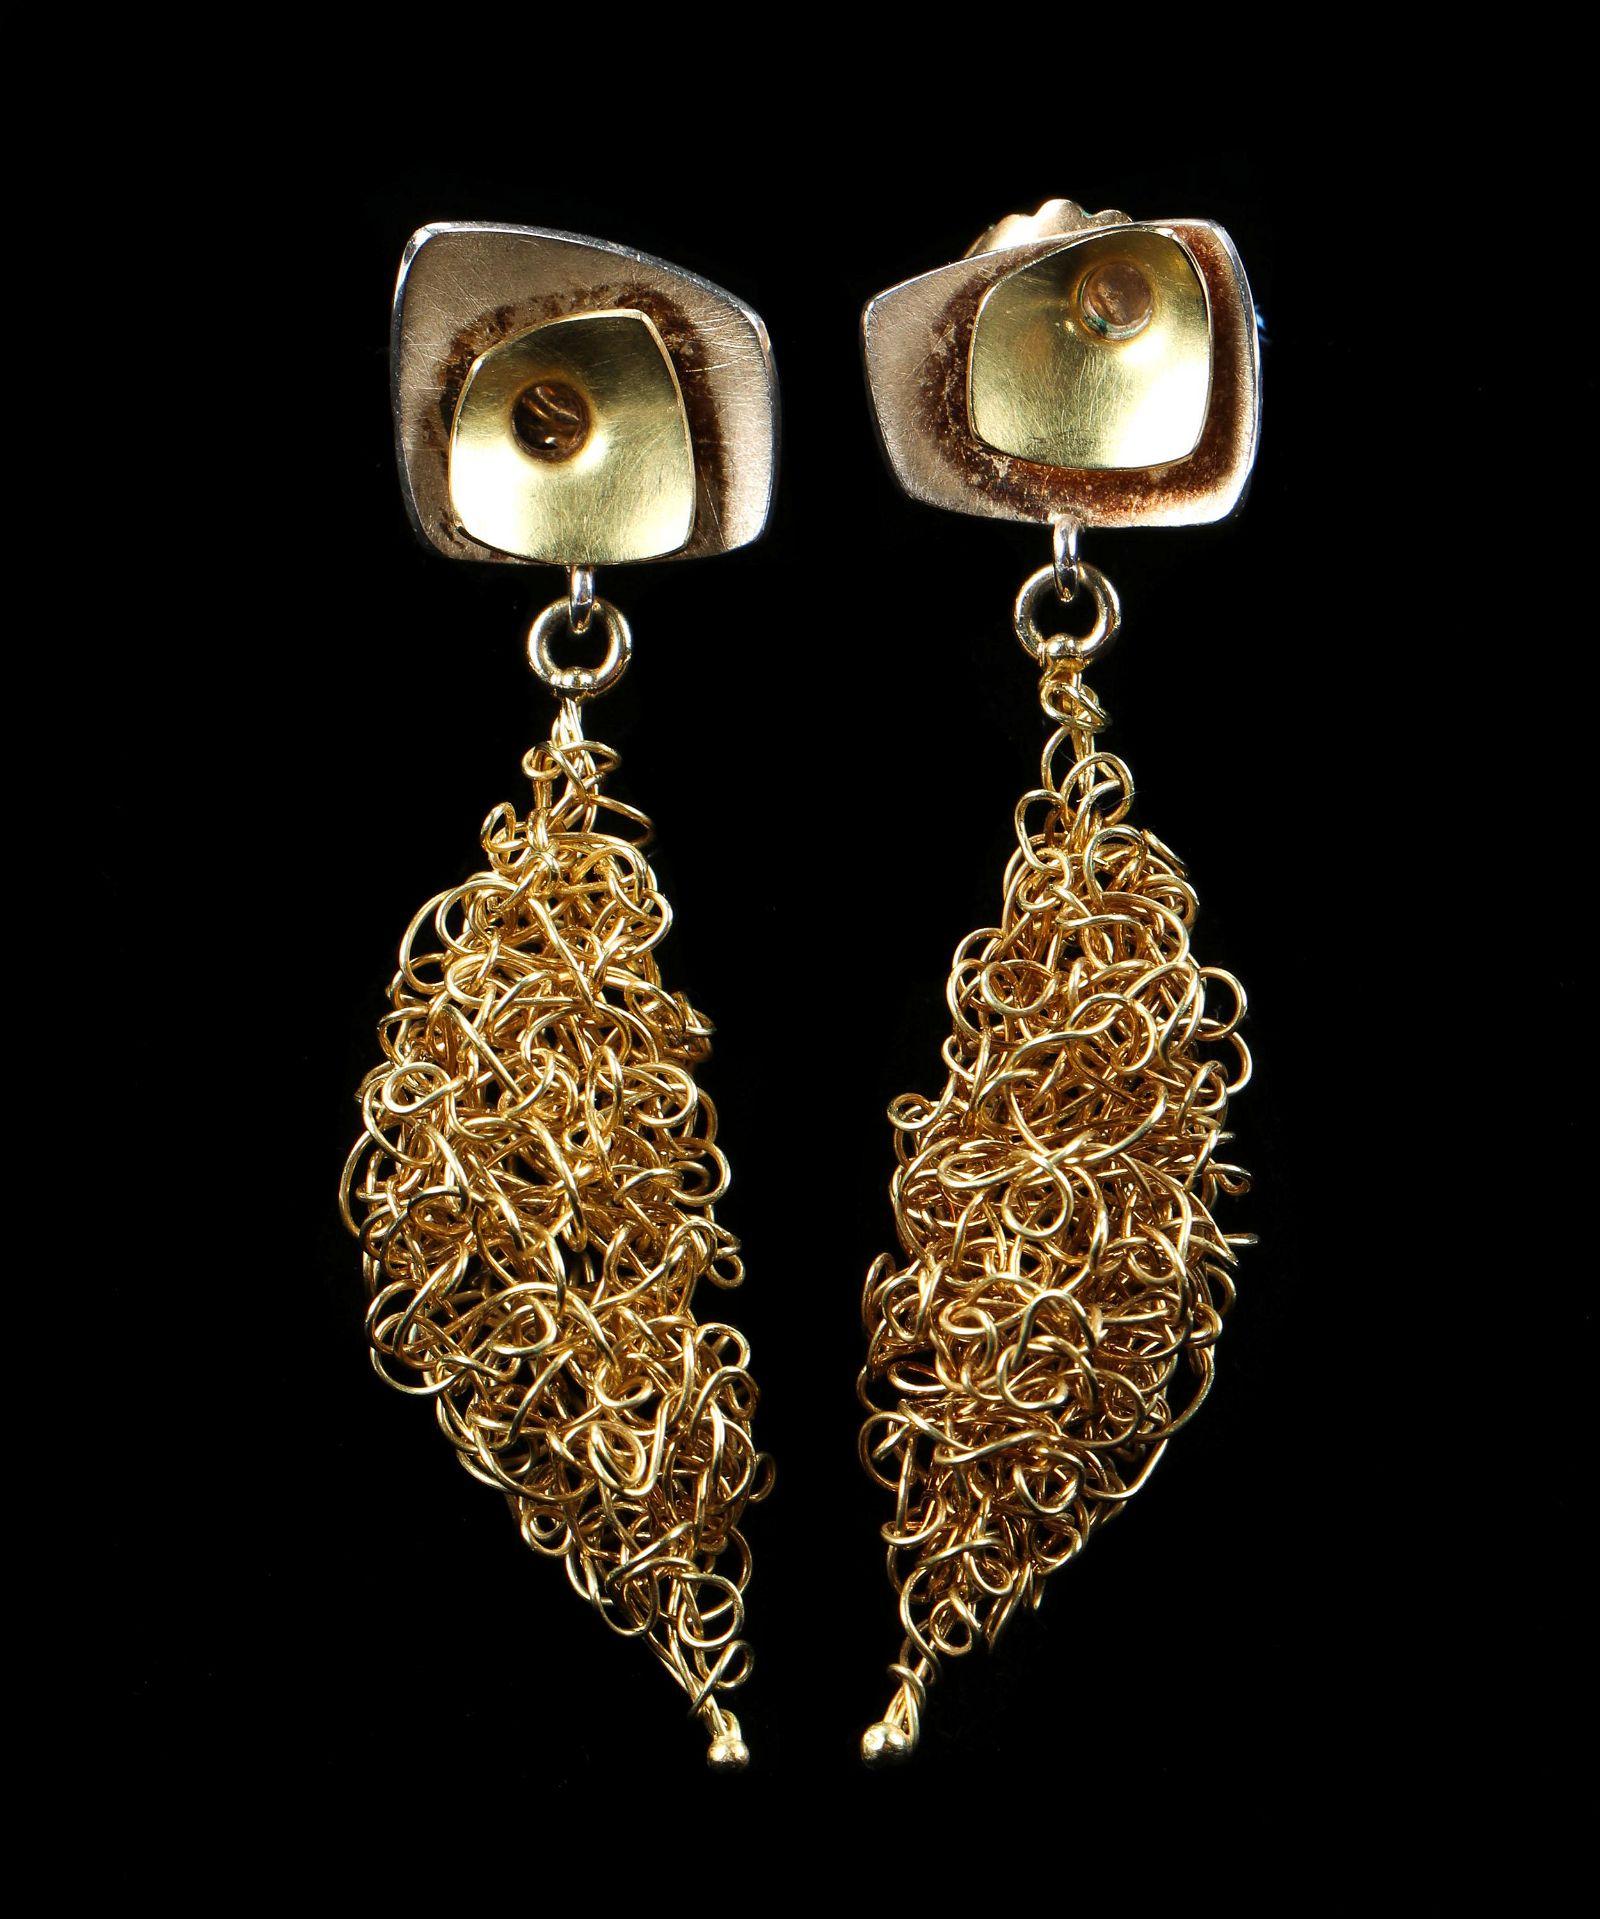 18k Gold Earrings Designed by Lynn Legare